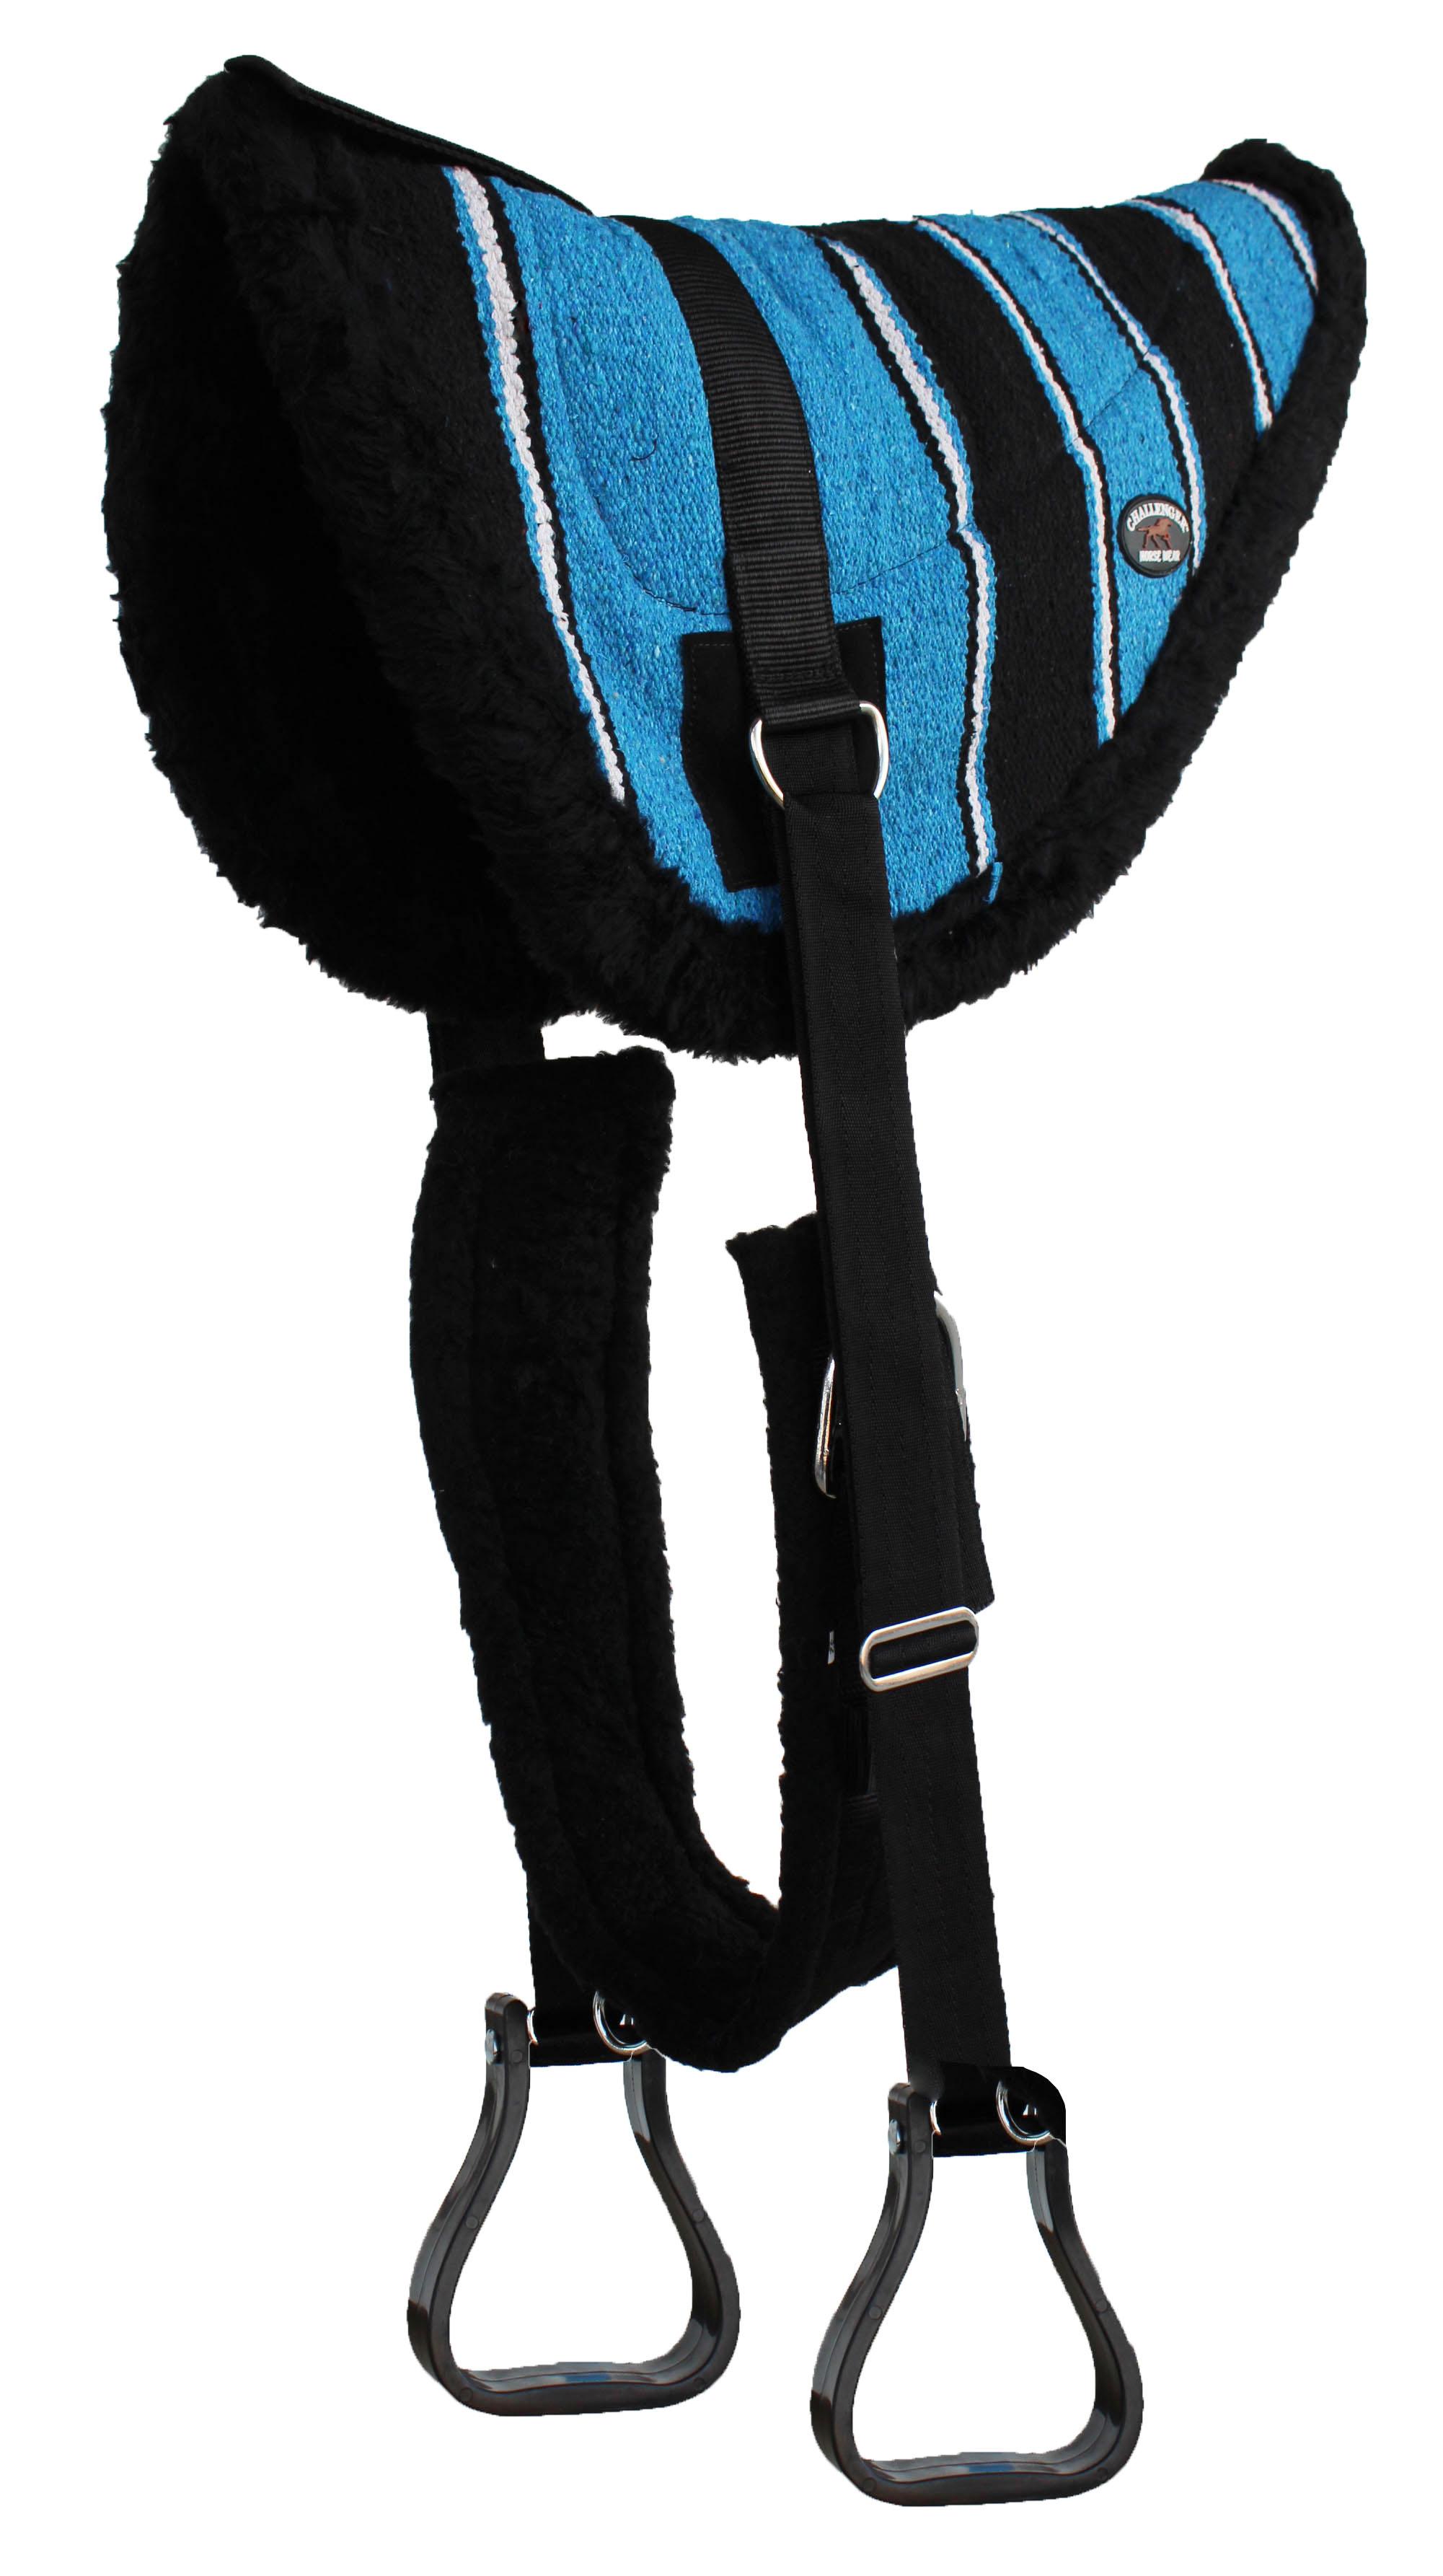 JUNIOR Treeless LEATHER BAREBACK PAD Comfort PONY SADDLE PAD with SAFETY HANDLE